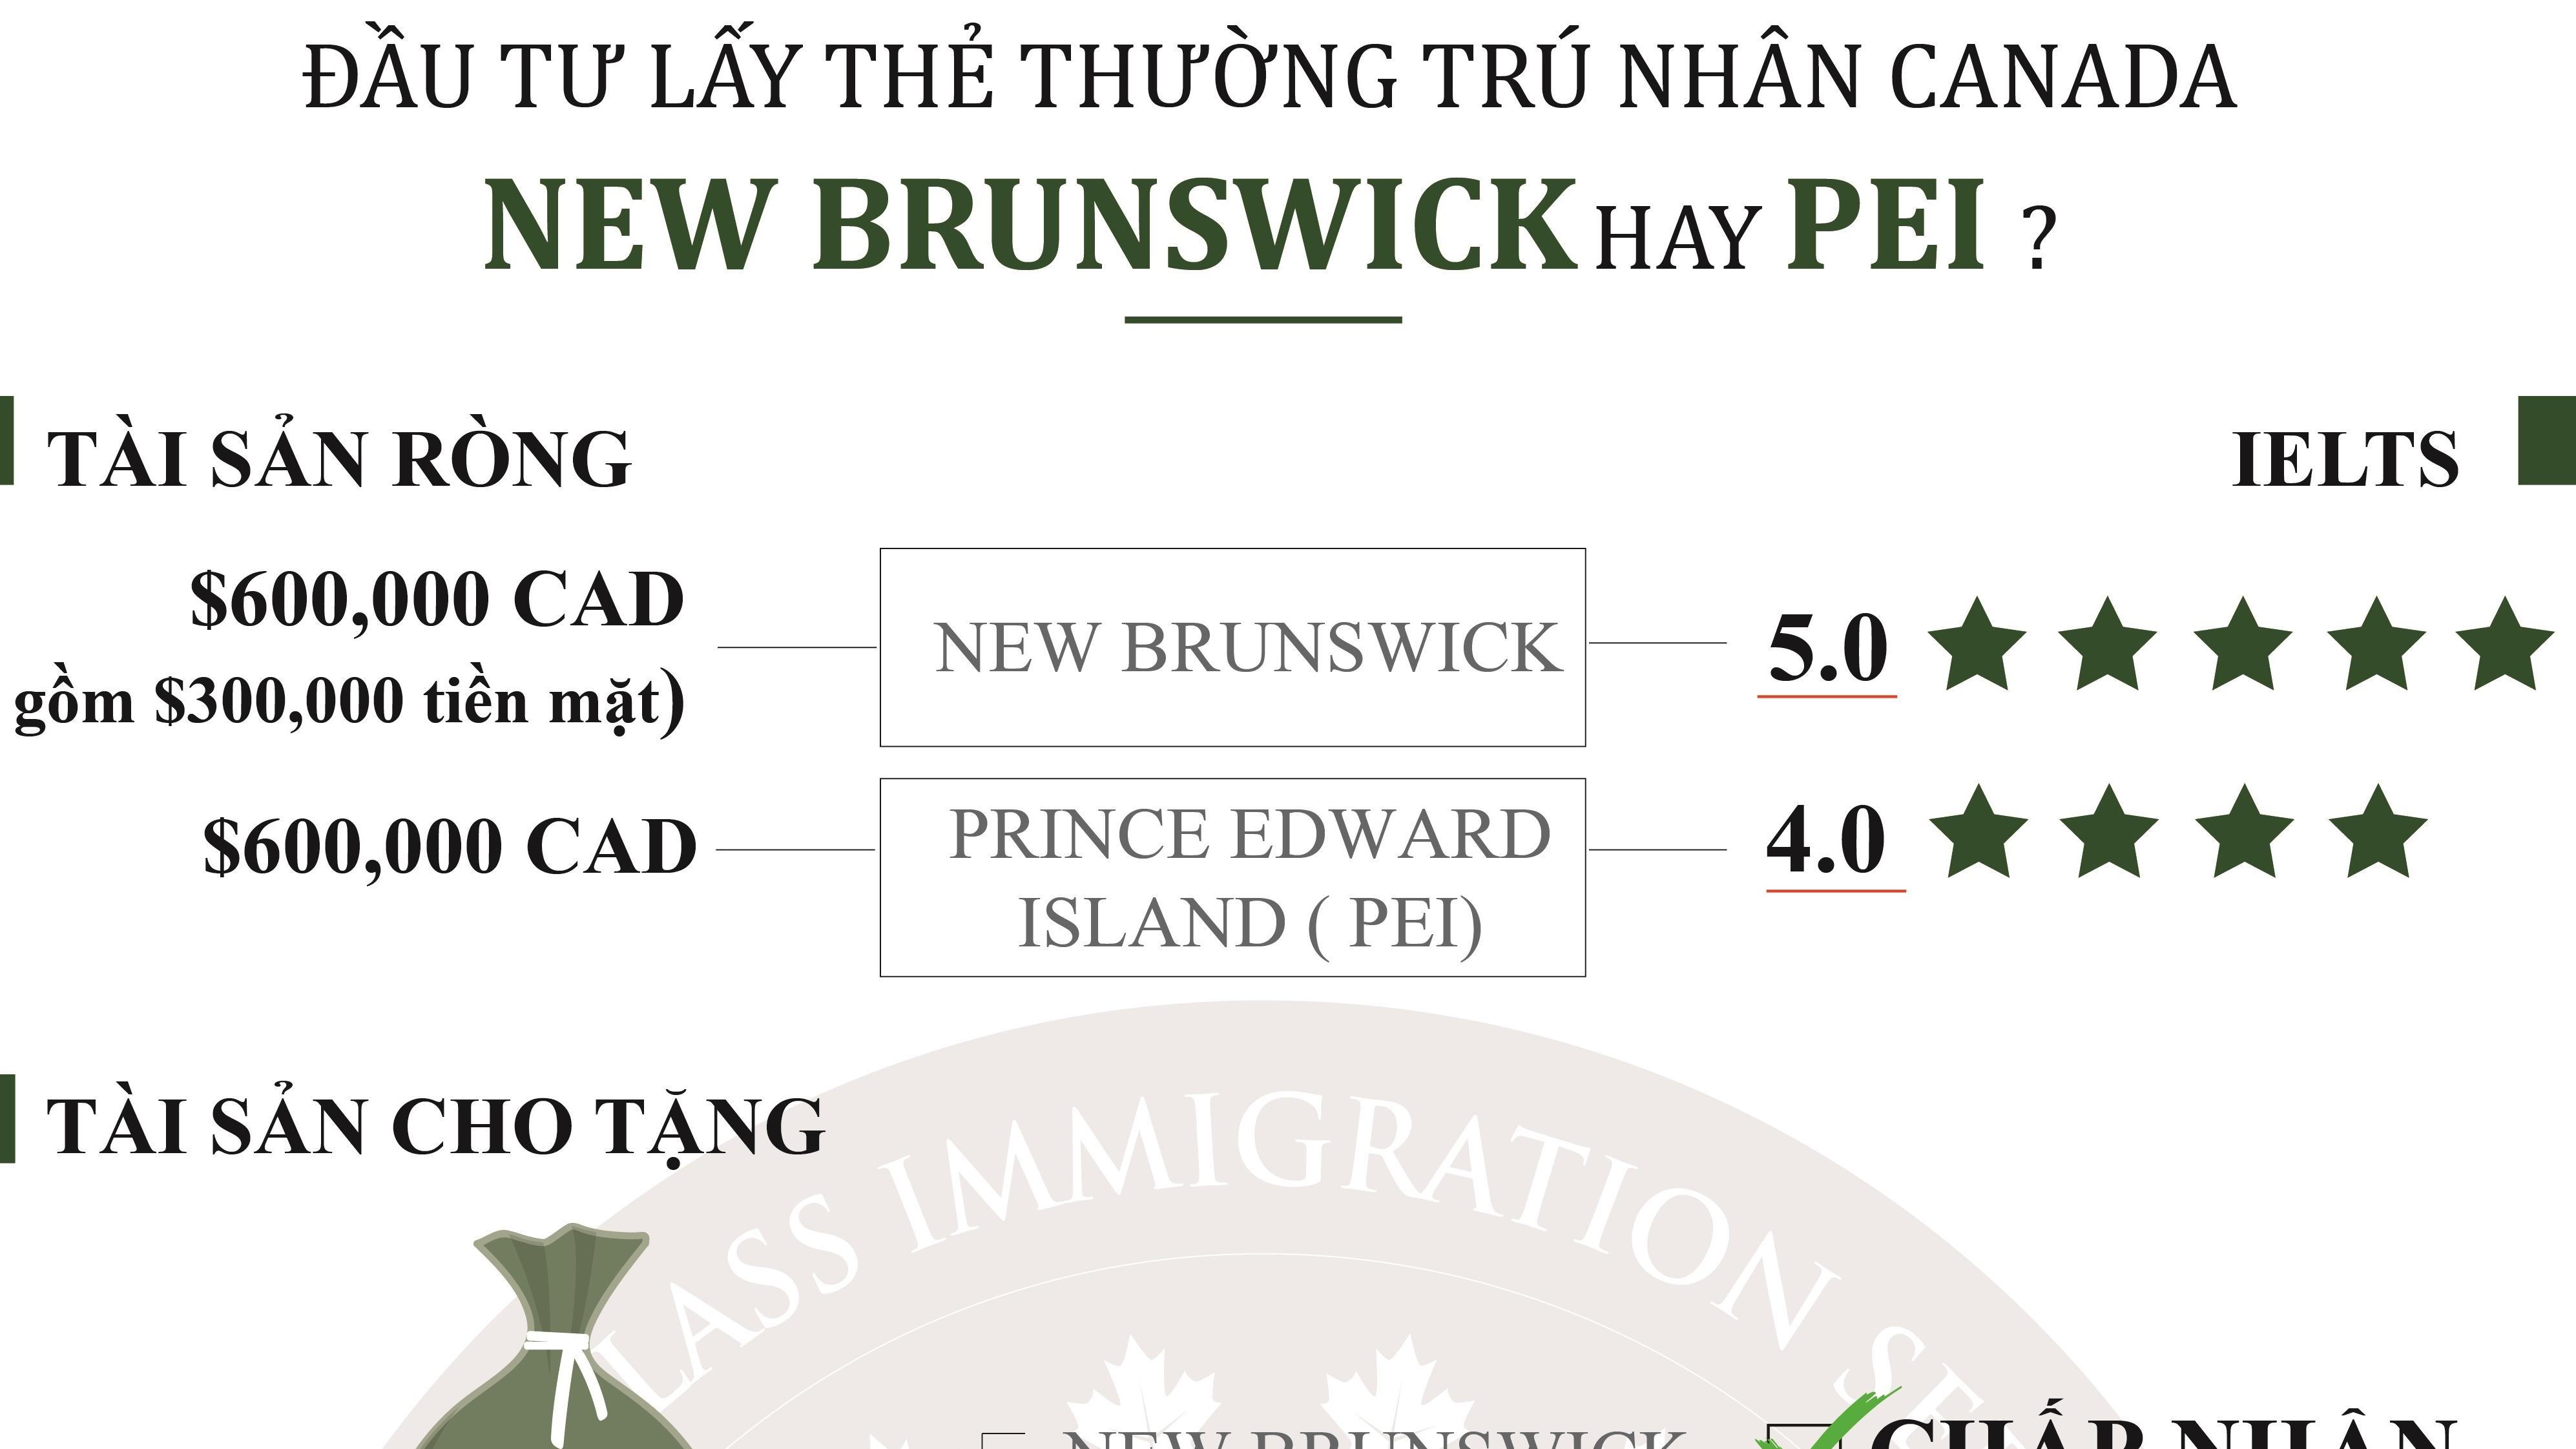 dau-tu-lay-the-thuong-tru-nhan-canada-newbrunswick-hay-pei